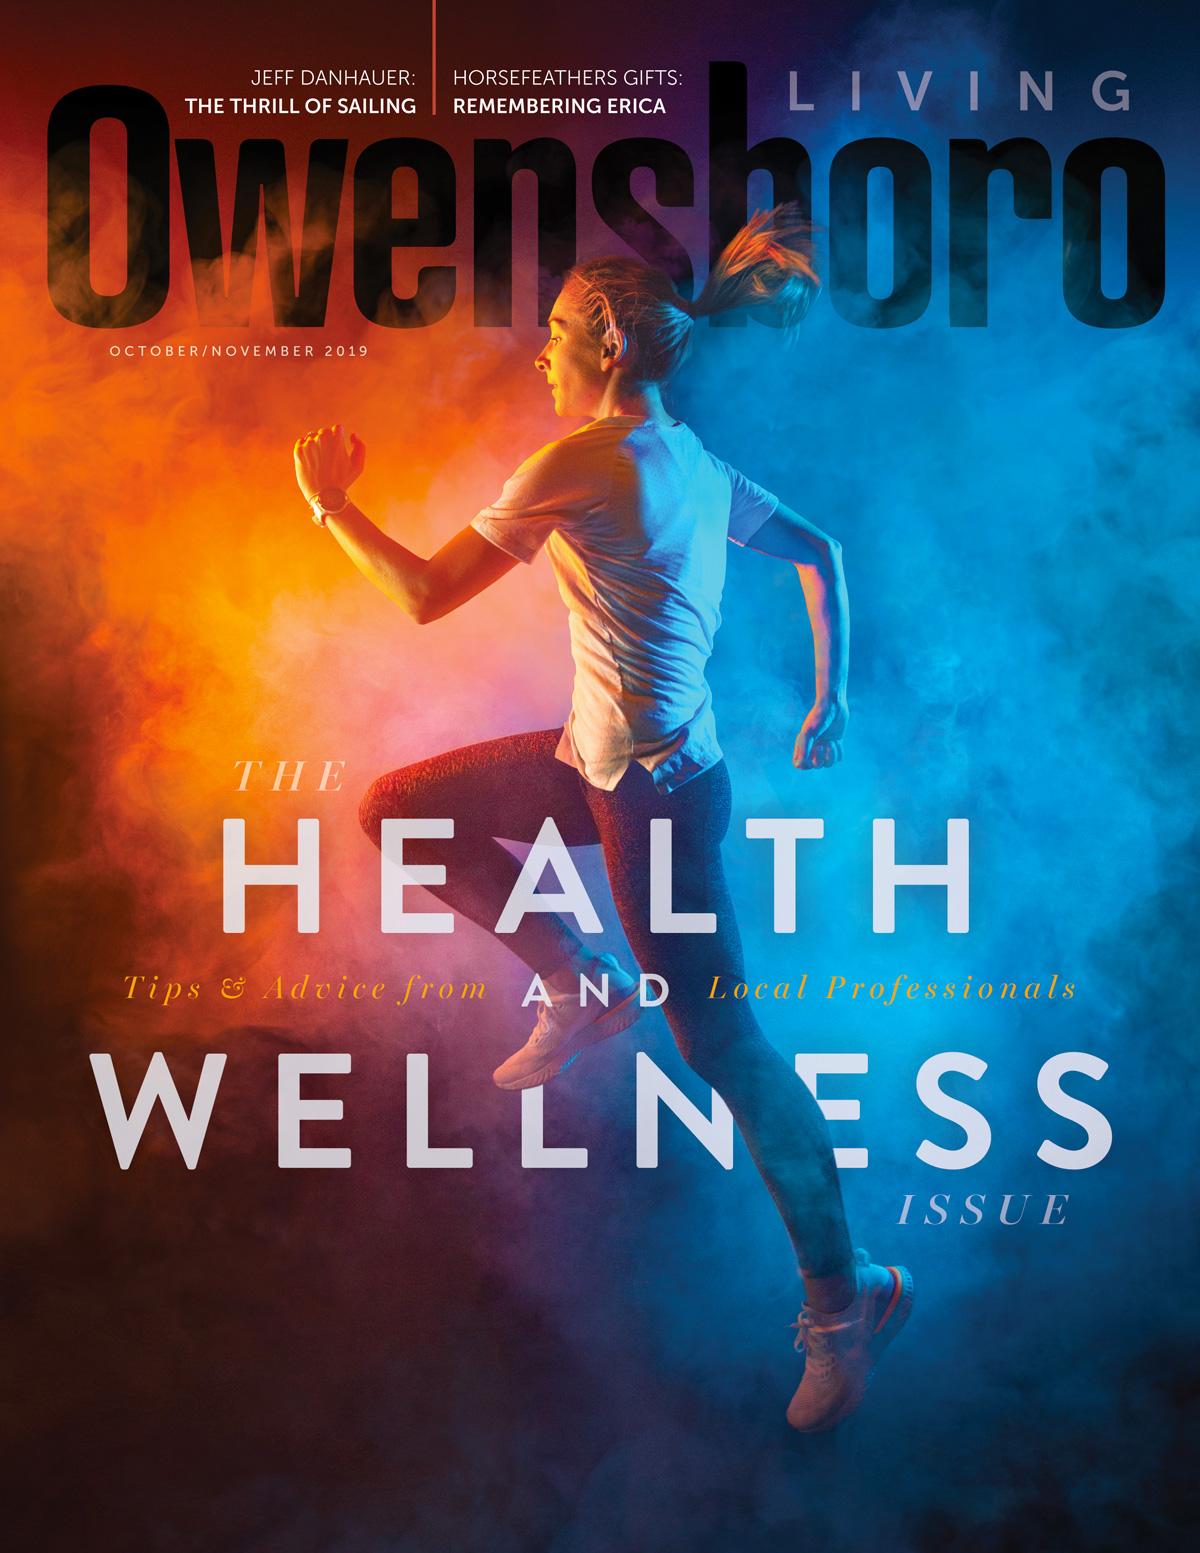 Owensboro Living October/November 2019 Cover